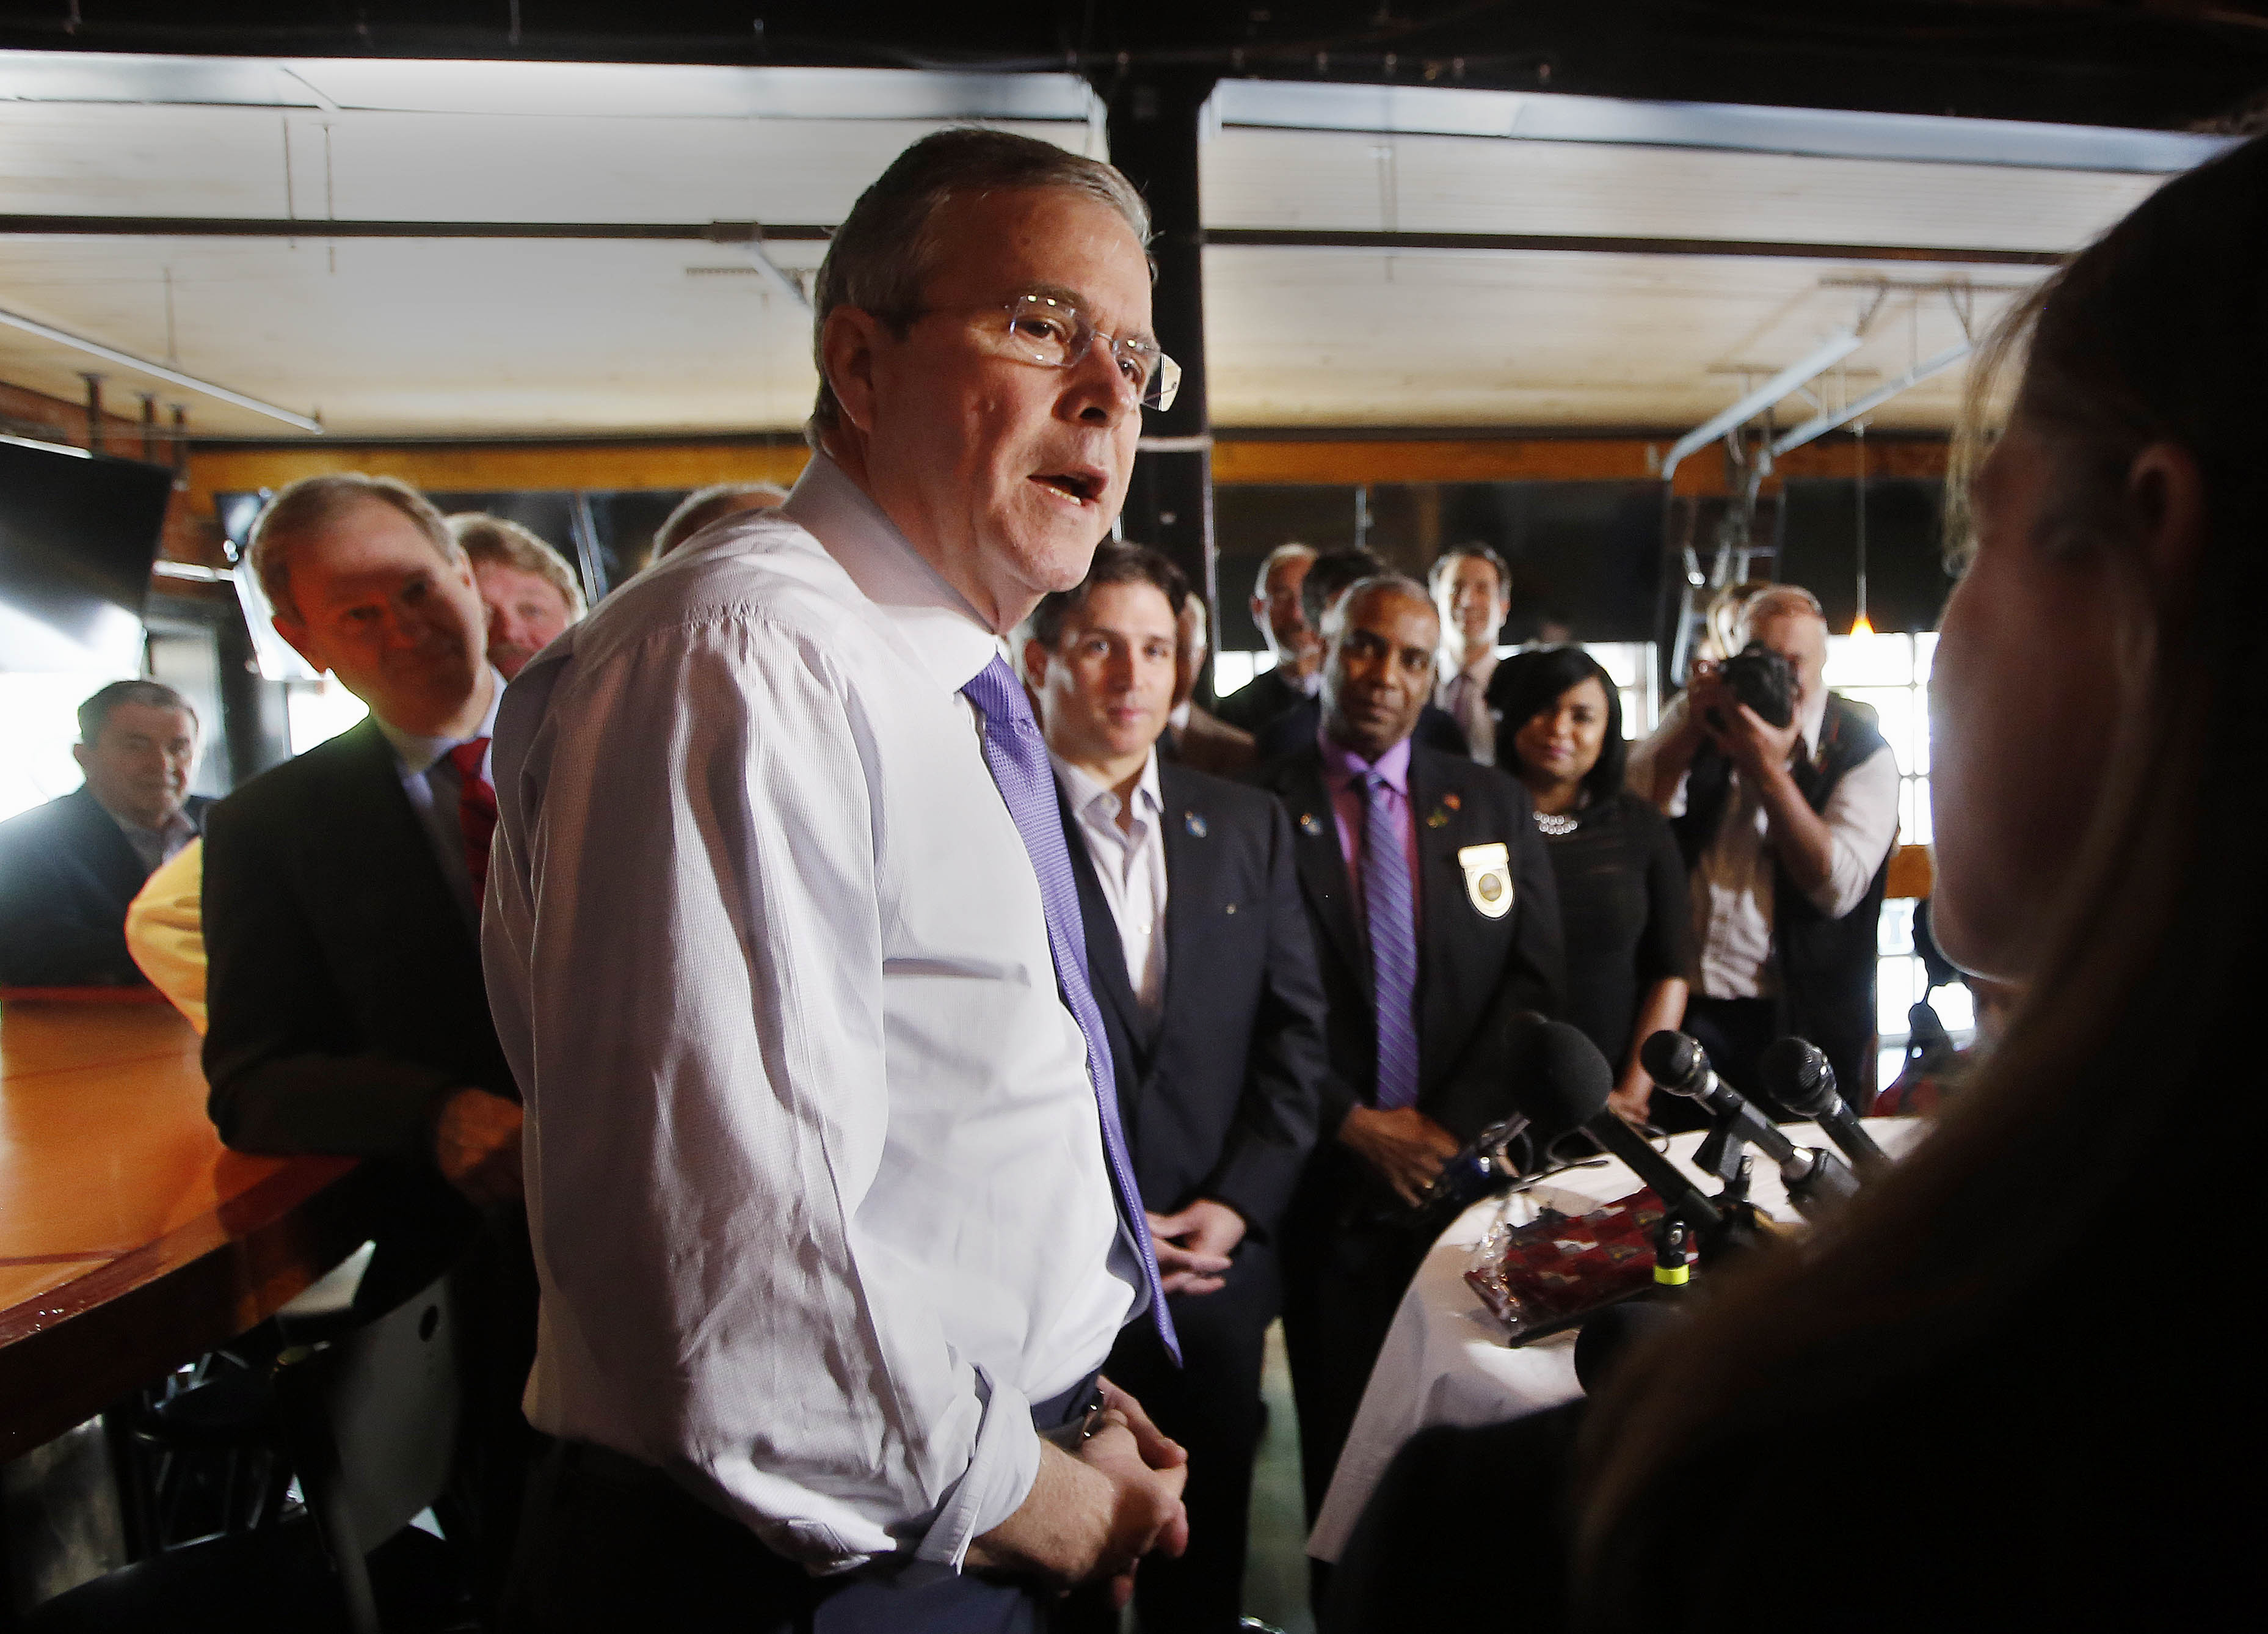 Former Florida Gov. Jeb Bush speaks at the Draft restaurant, Thursday, May 21, 2015, in Concord, N.H.